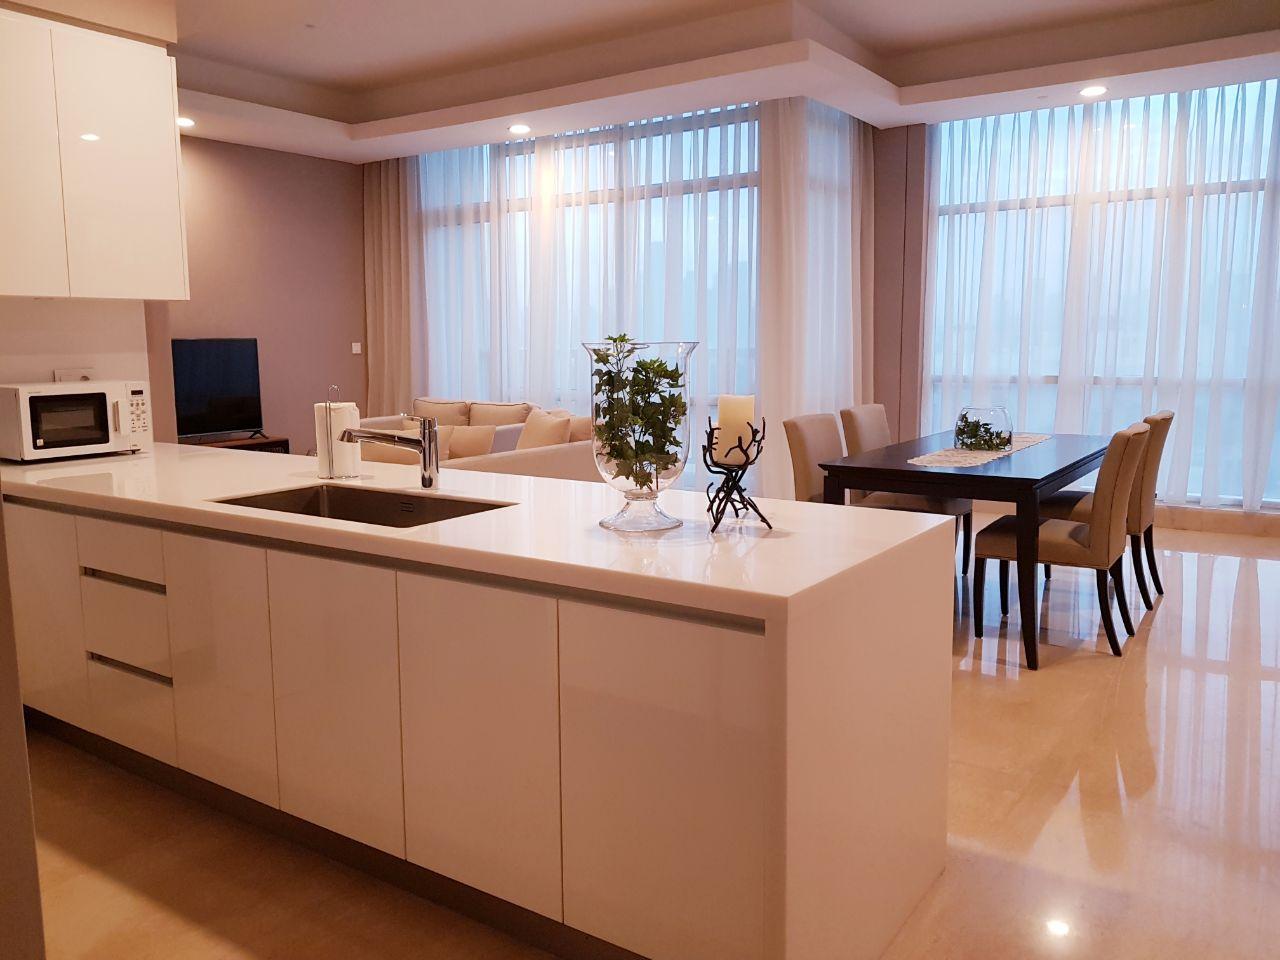 For Rent La Maison Apartment at Barito - Kebayoran Baru